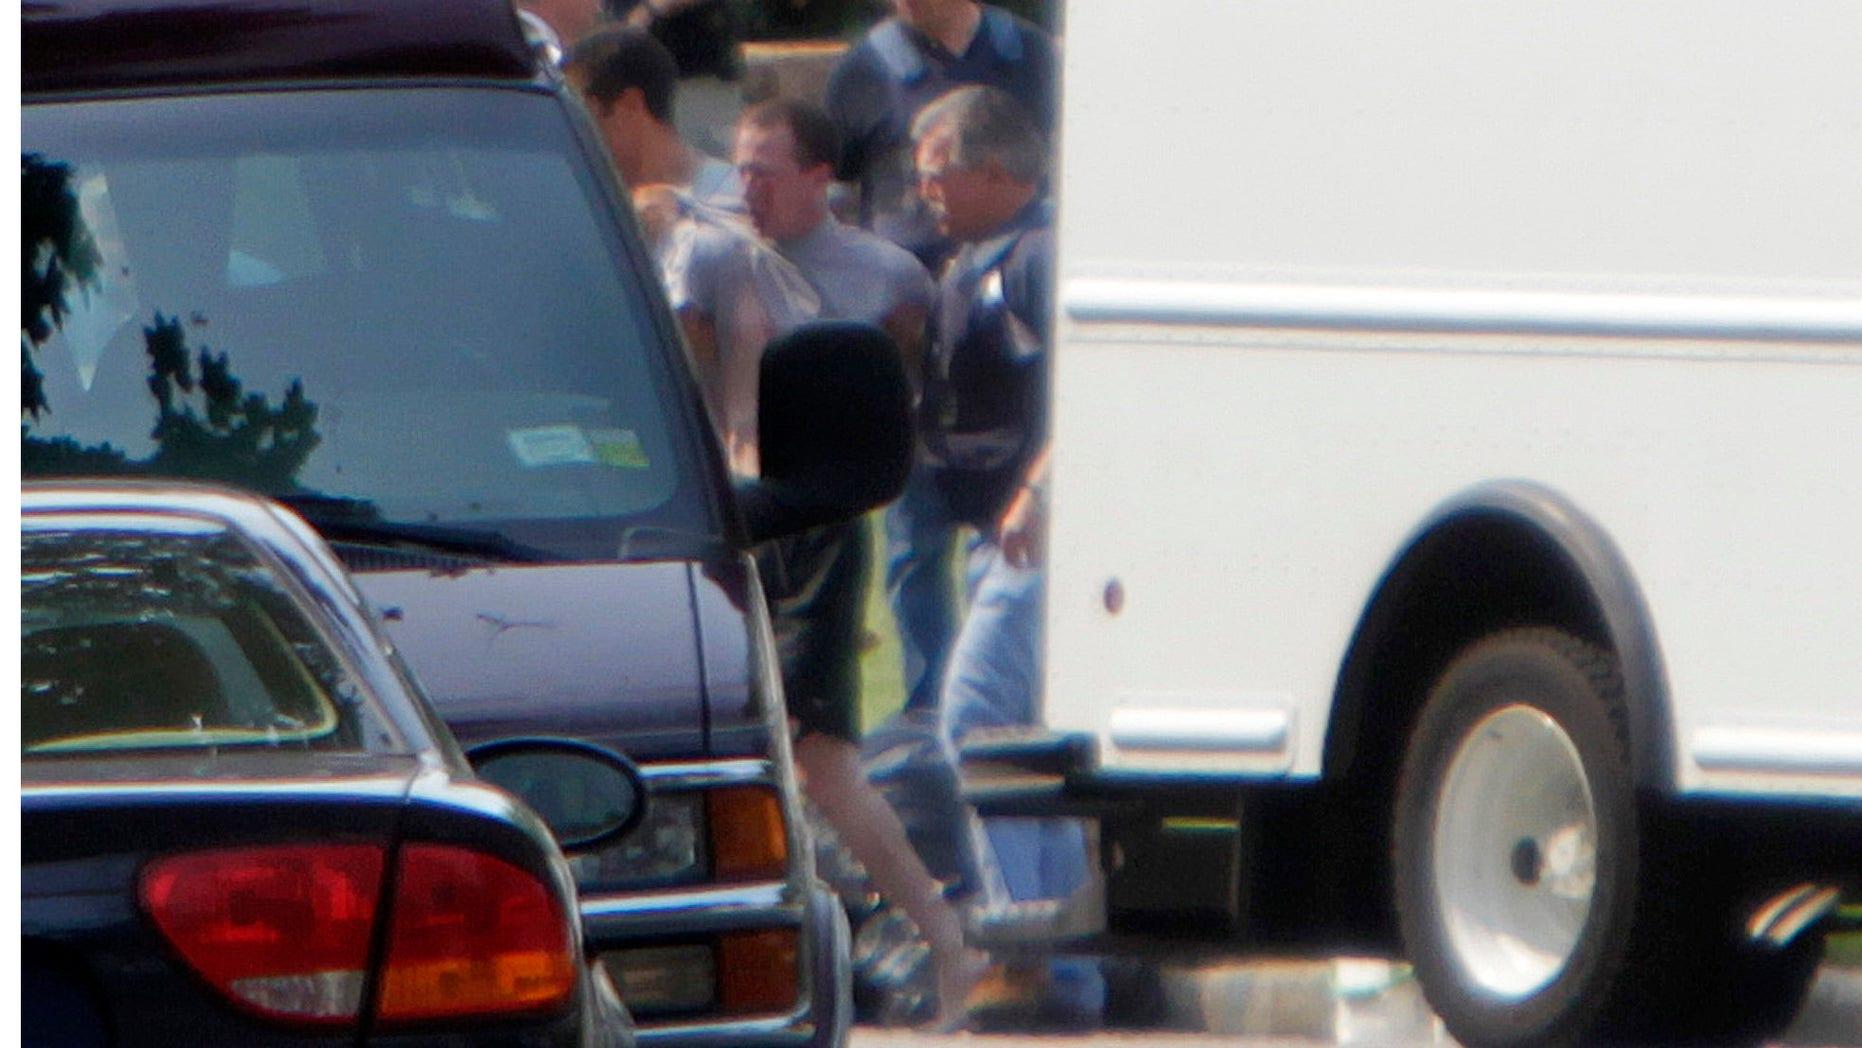 Suffolk County police  in Medford, N.Y., Wednesday, June 22, 2011.